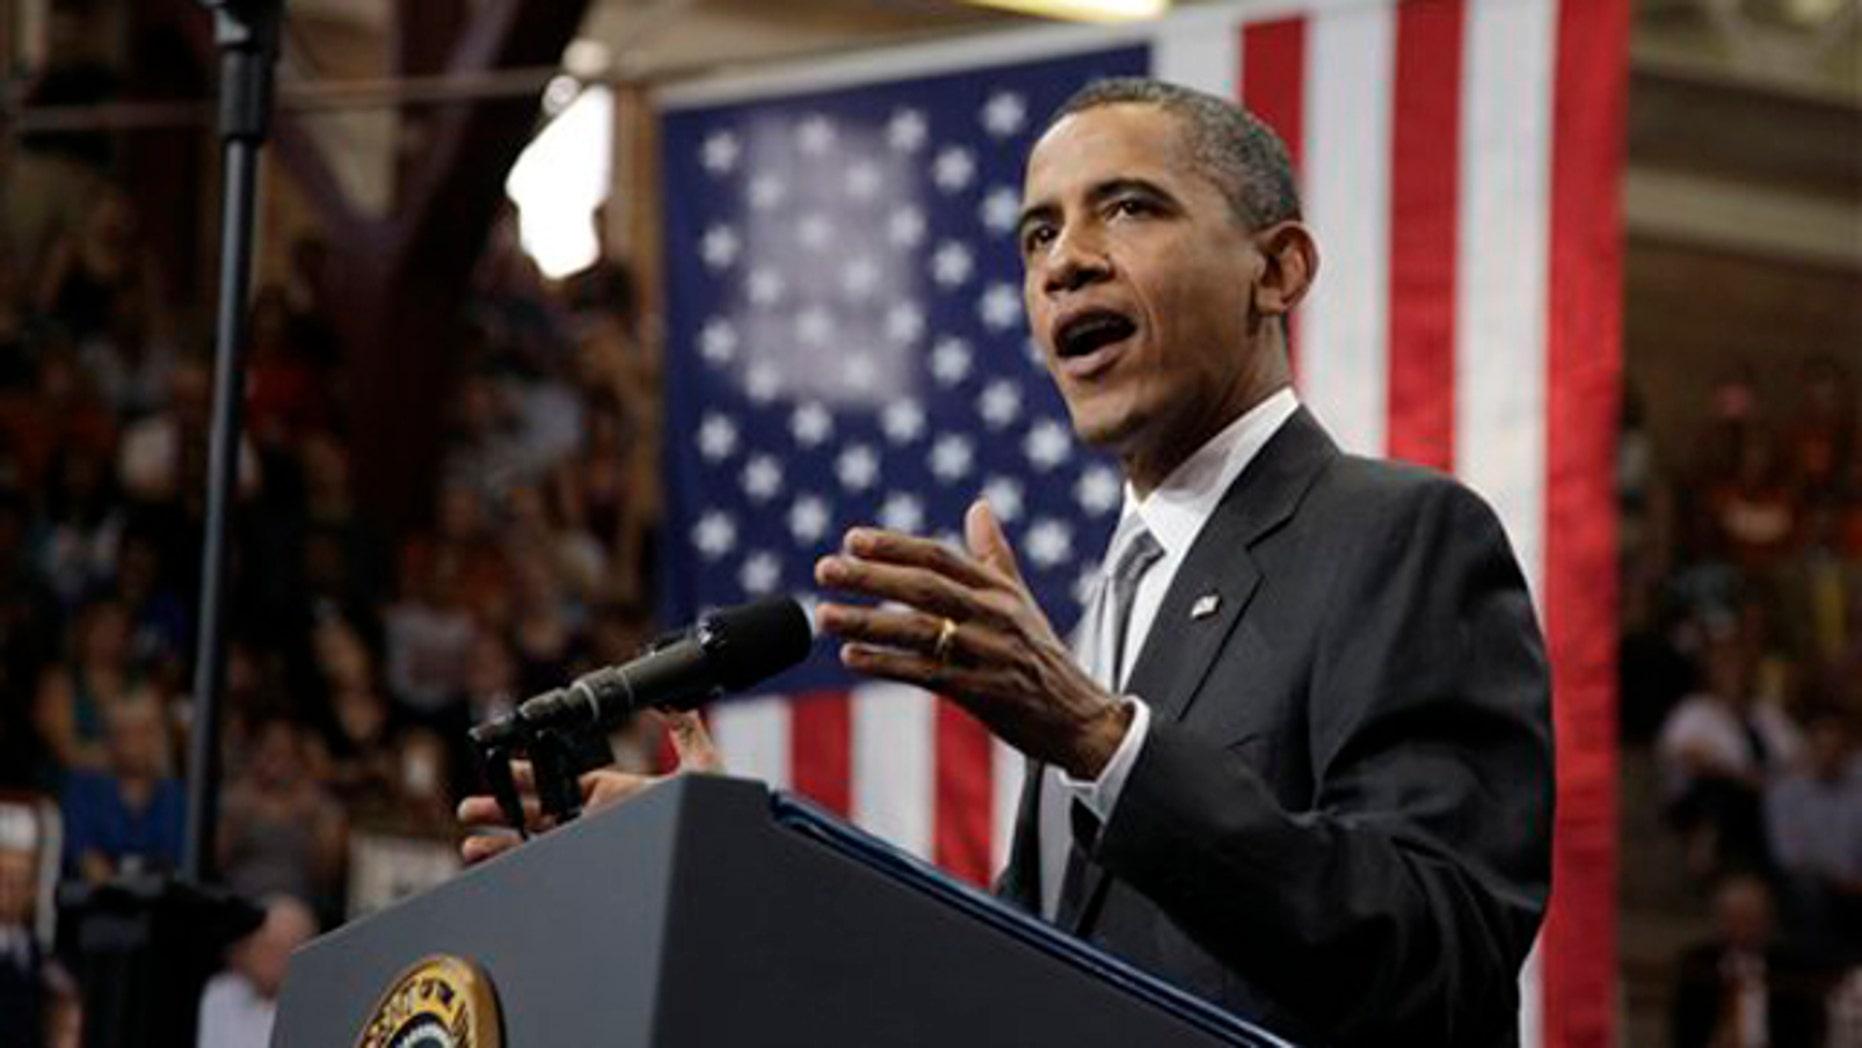 President Obama speaks at a fundraiser Aug. 9 in Austin, Texas. (AP Photo)